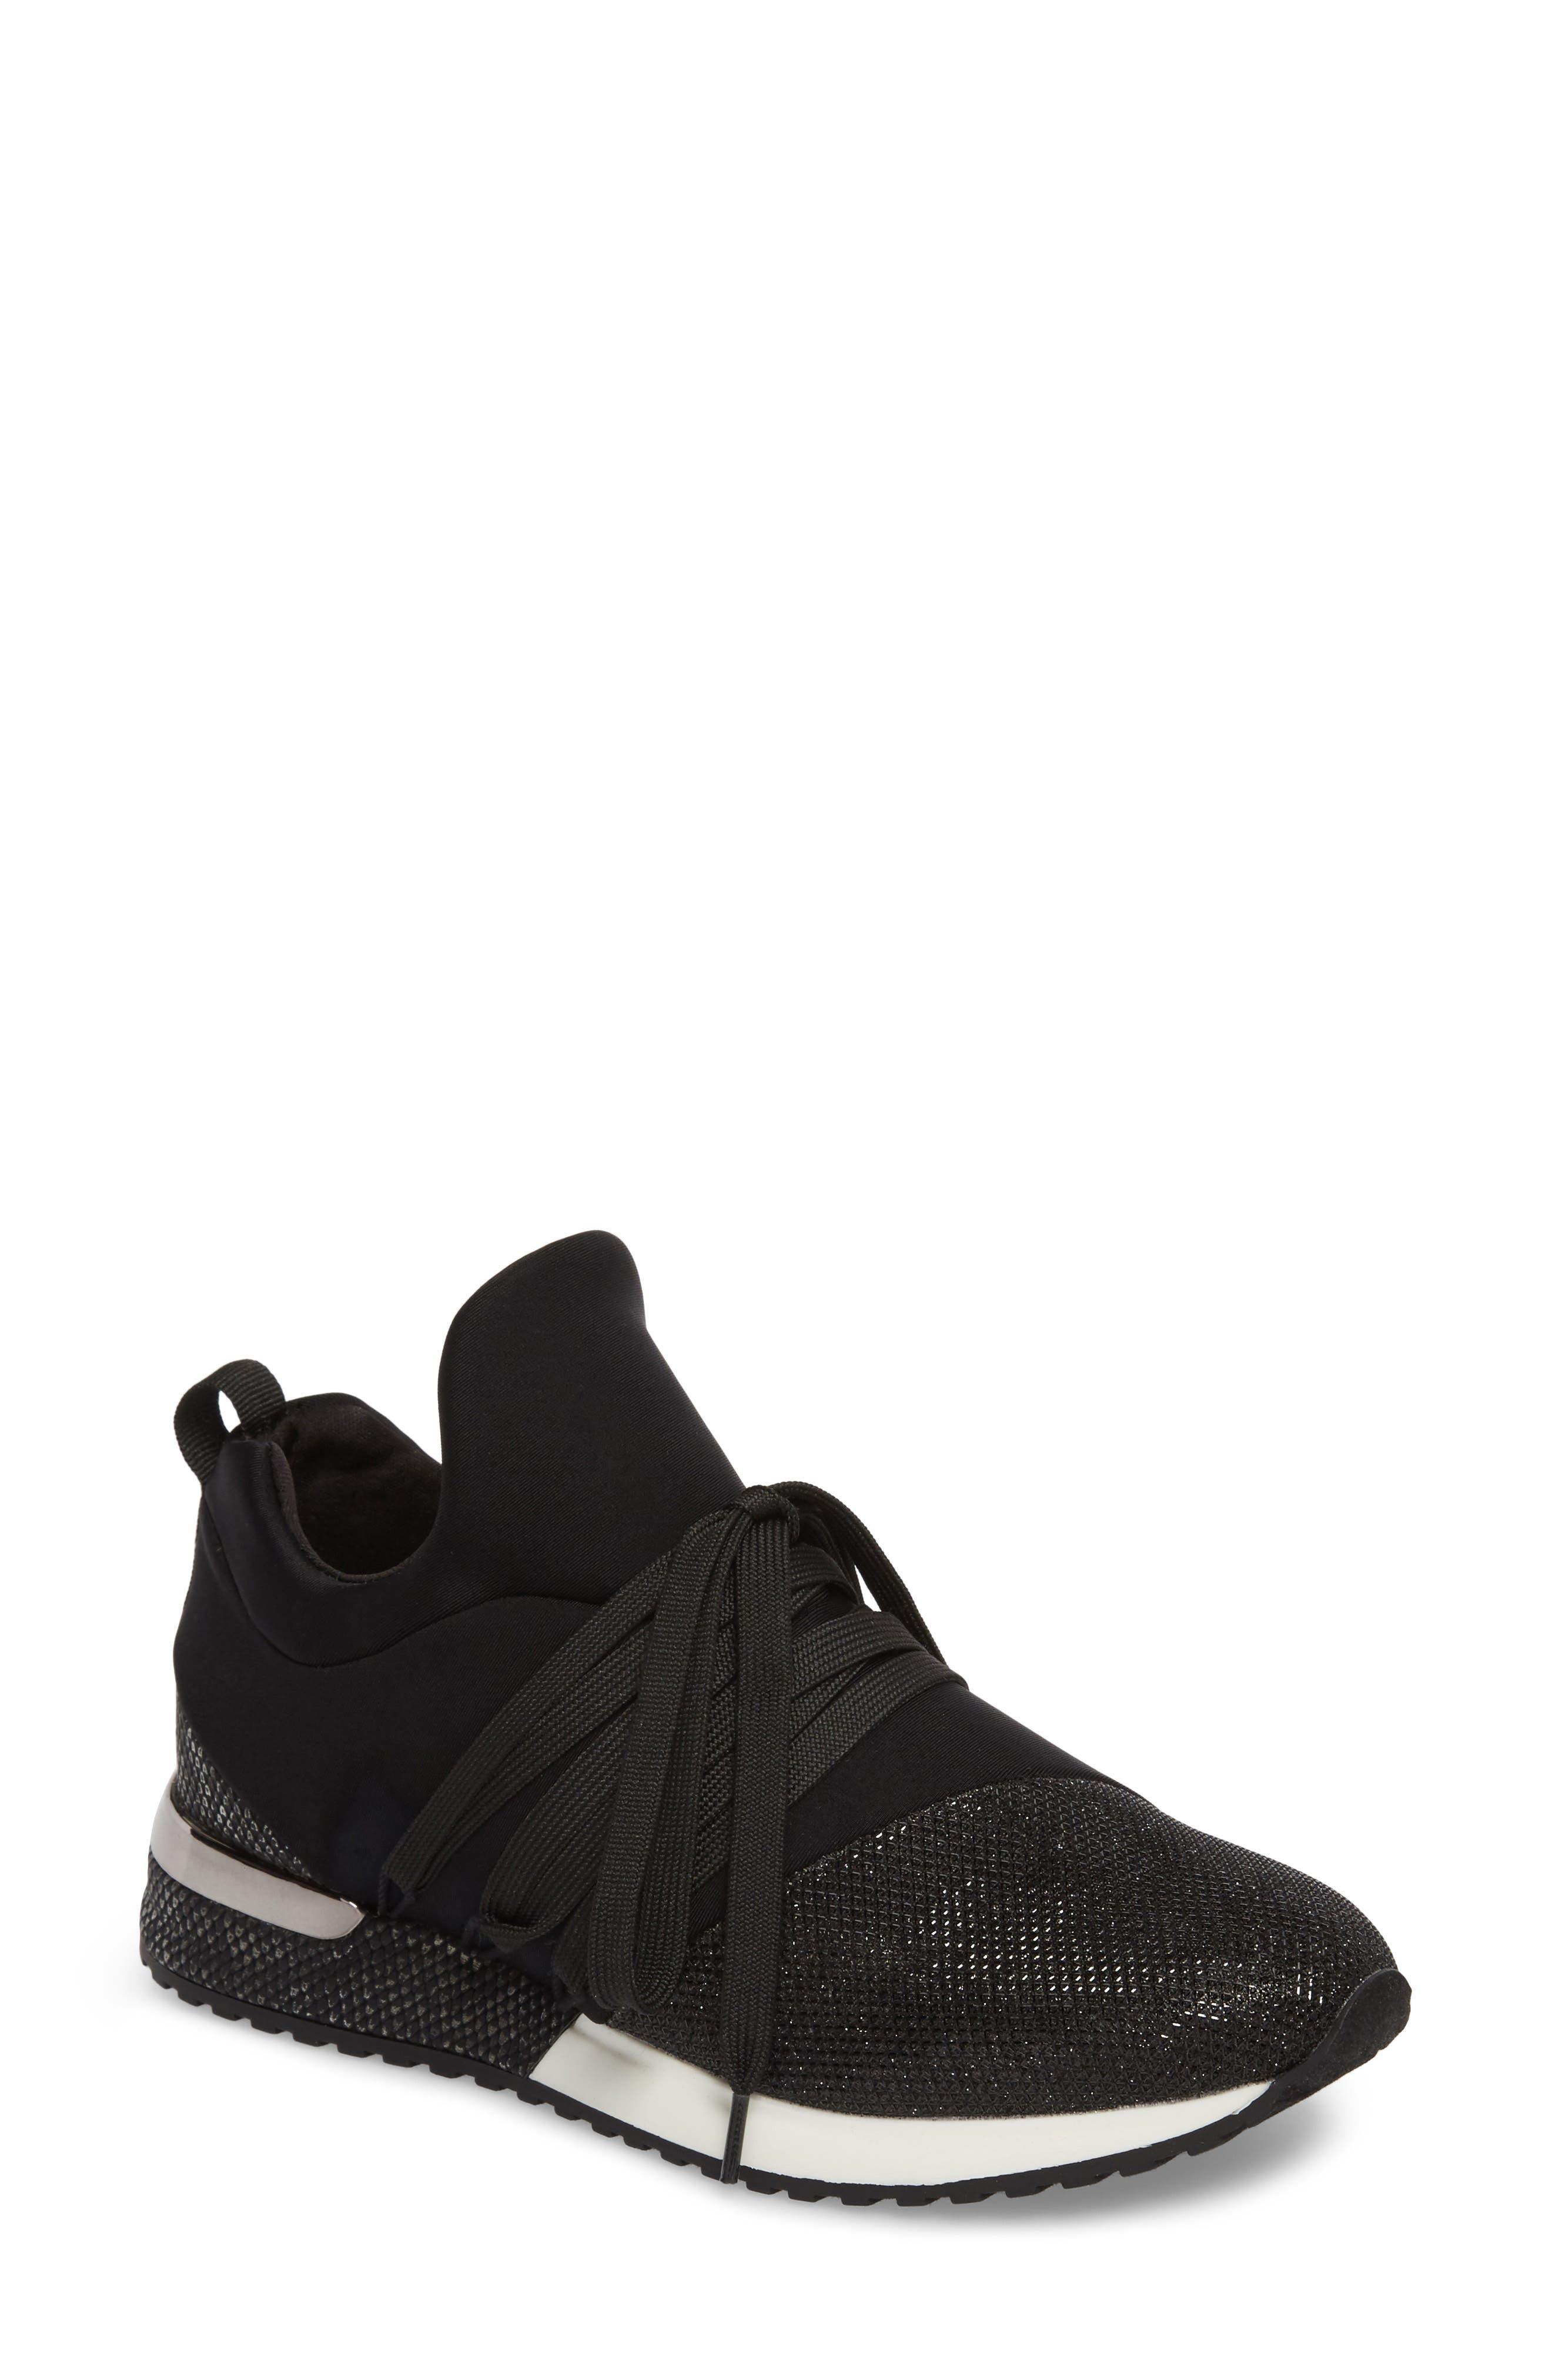 Zorro Sneaker,                             Main thumbnail 1, color,                             BLACK FABRIC